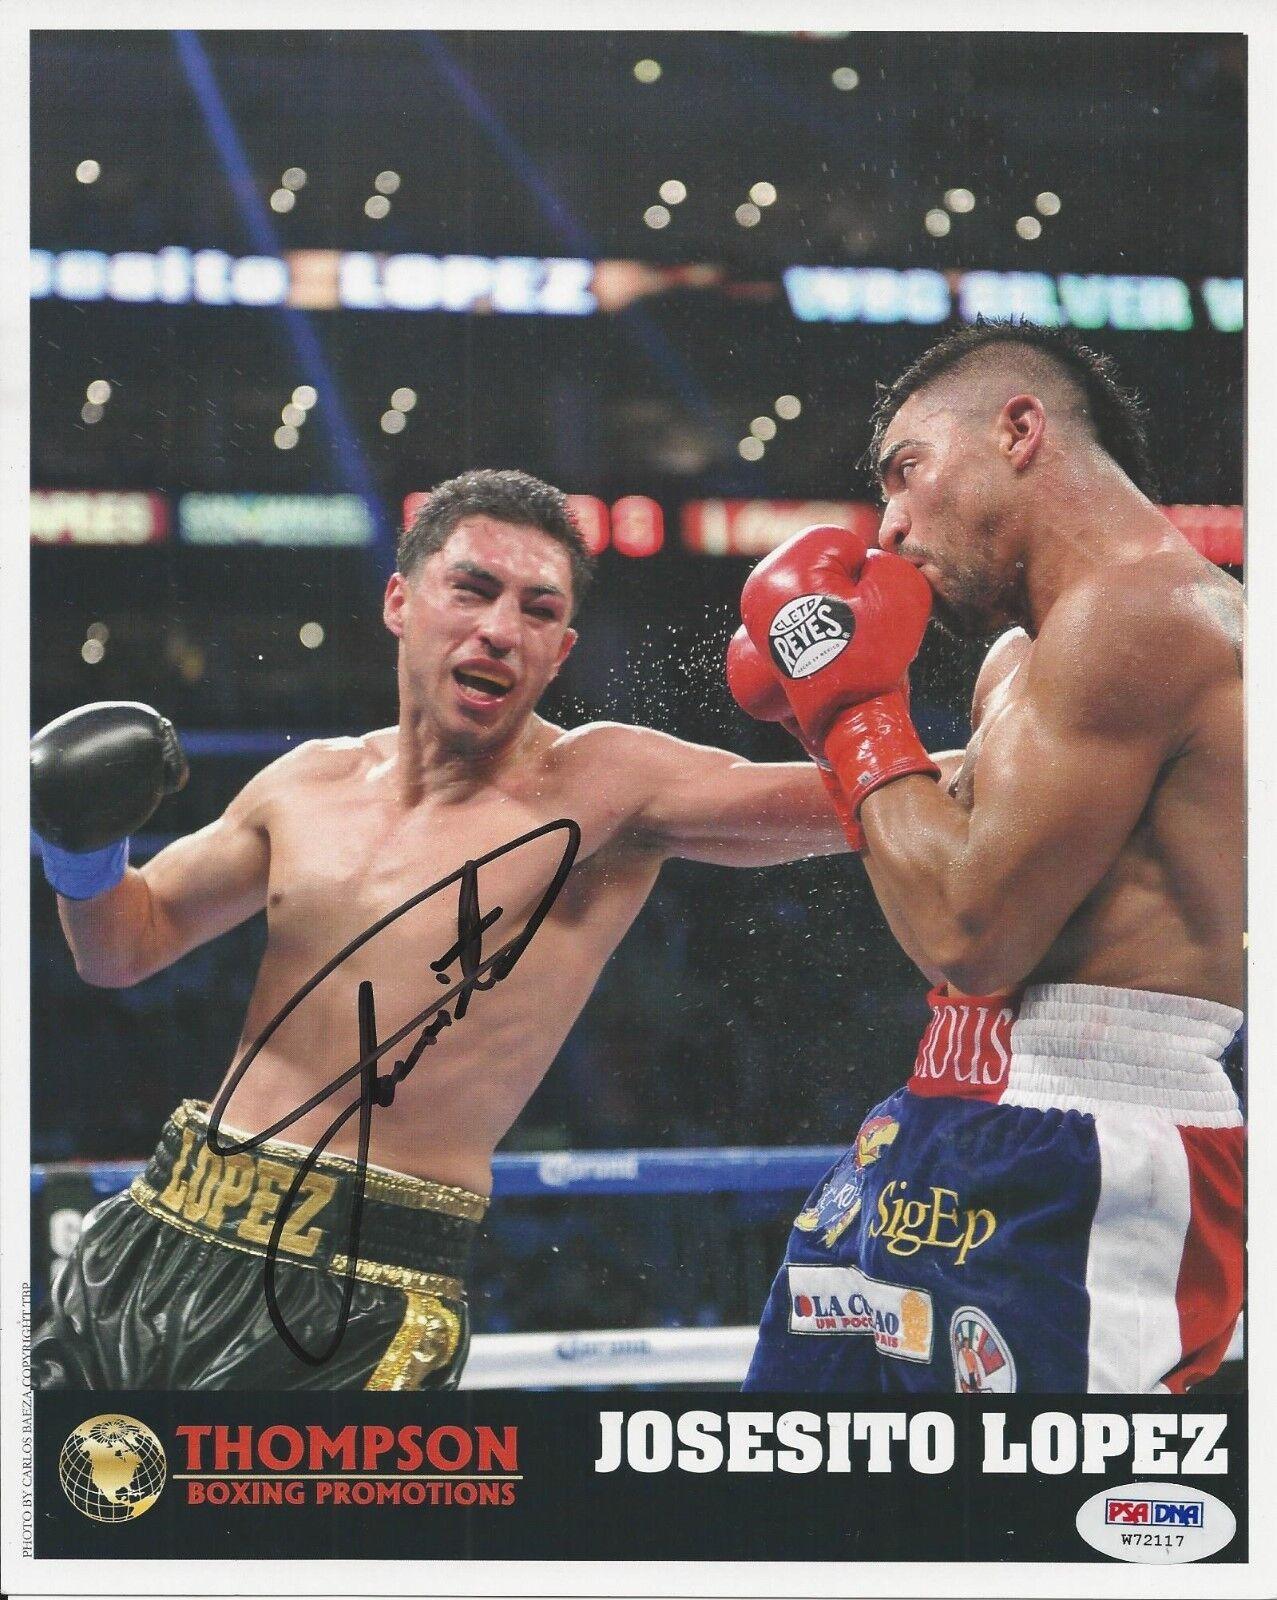 Josesito Lopez signed 8x10 Boxing Photo PSA/DNA # W72117